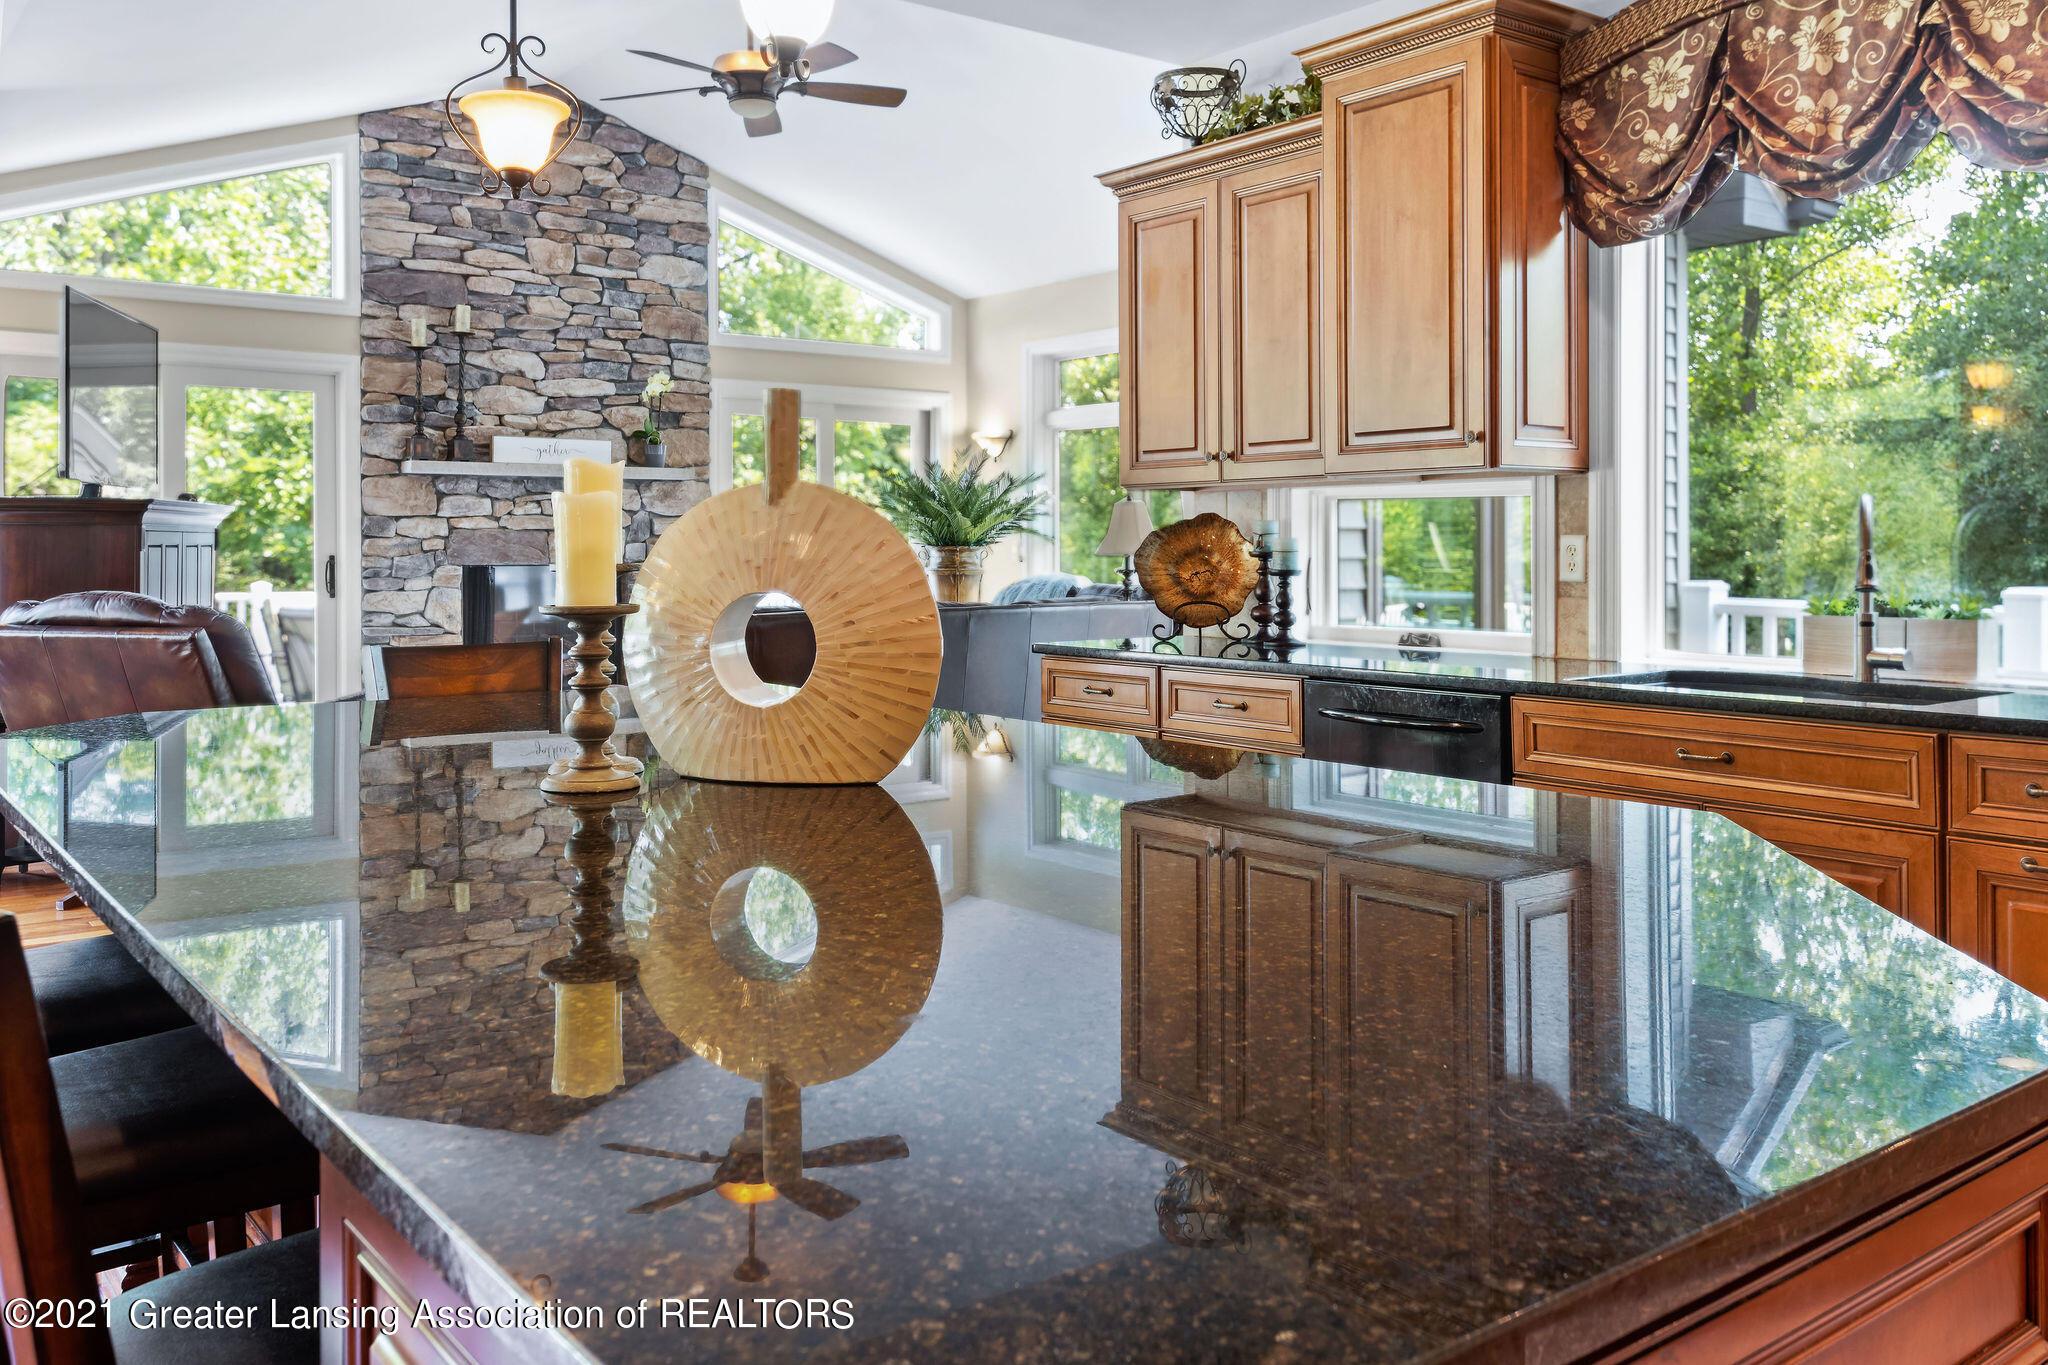 910 Abbey Rd - large kitchen island - 12